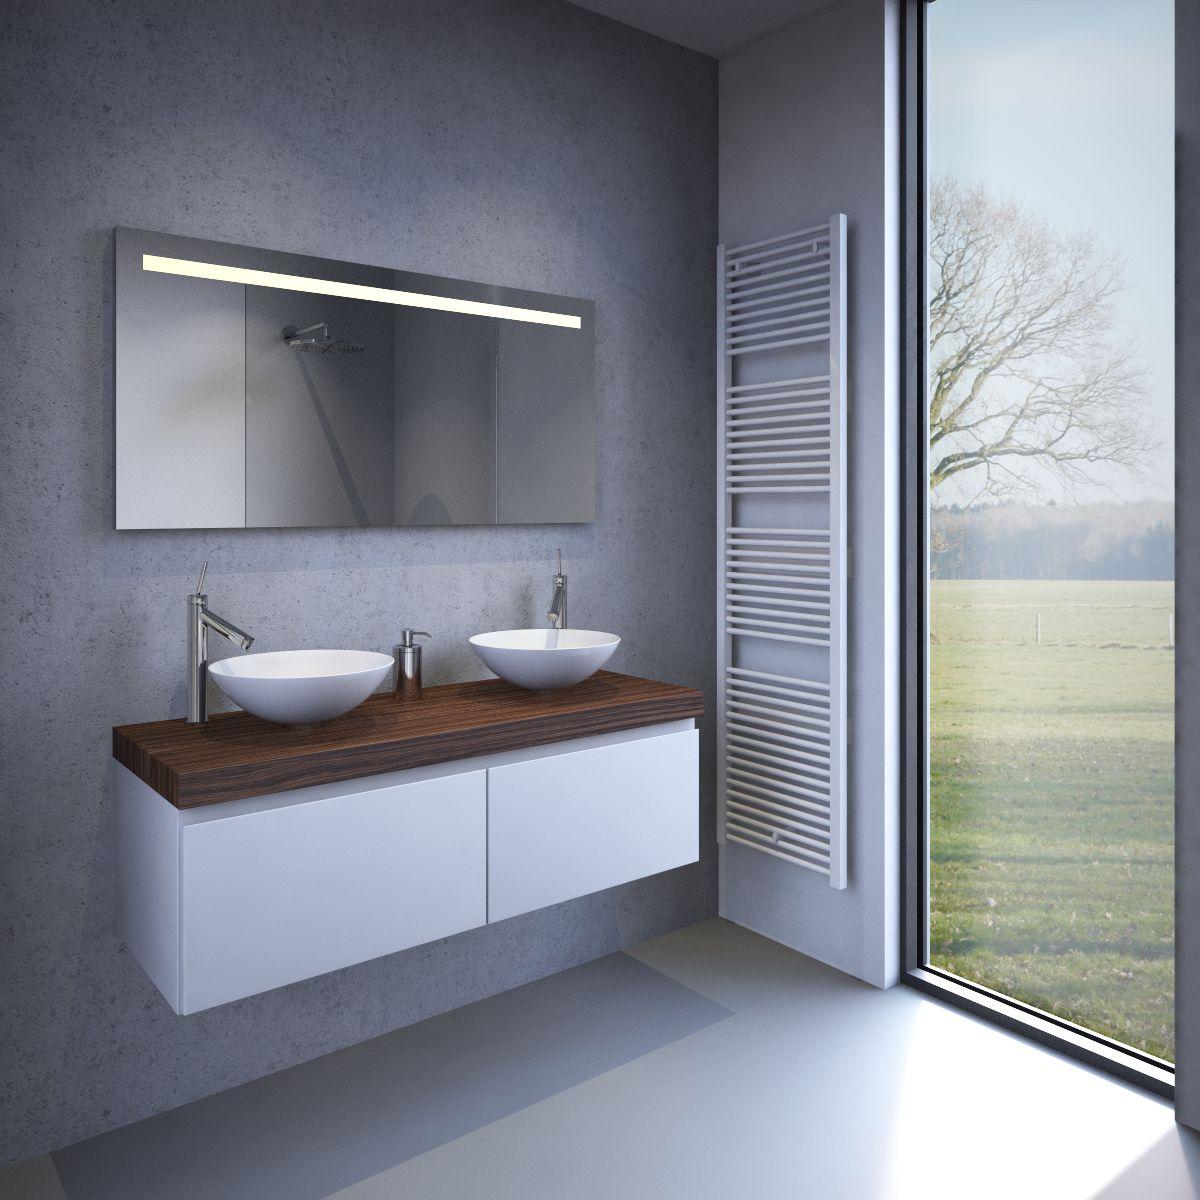 Badkamer led spiegel met verwarming en sensor 120x60 cm designspiegels - Model badkamer design ...